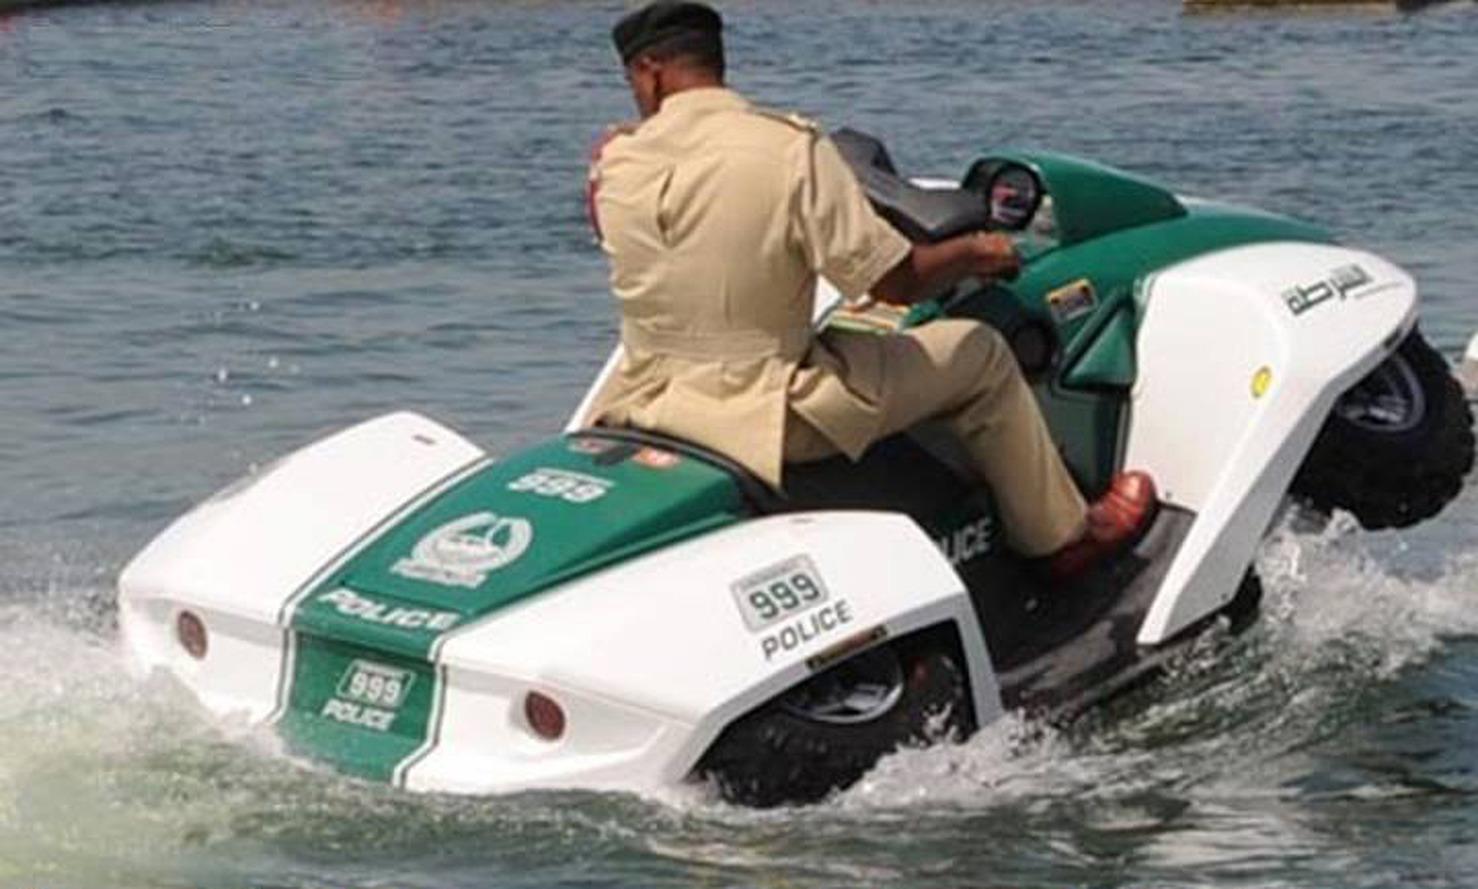 Dubai Police Added a Quadski to its Supercar Fleet